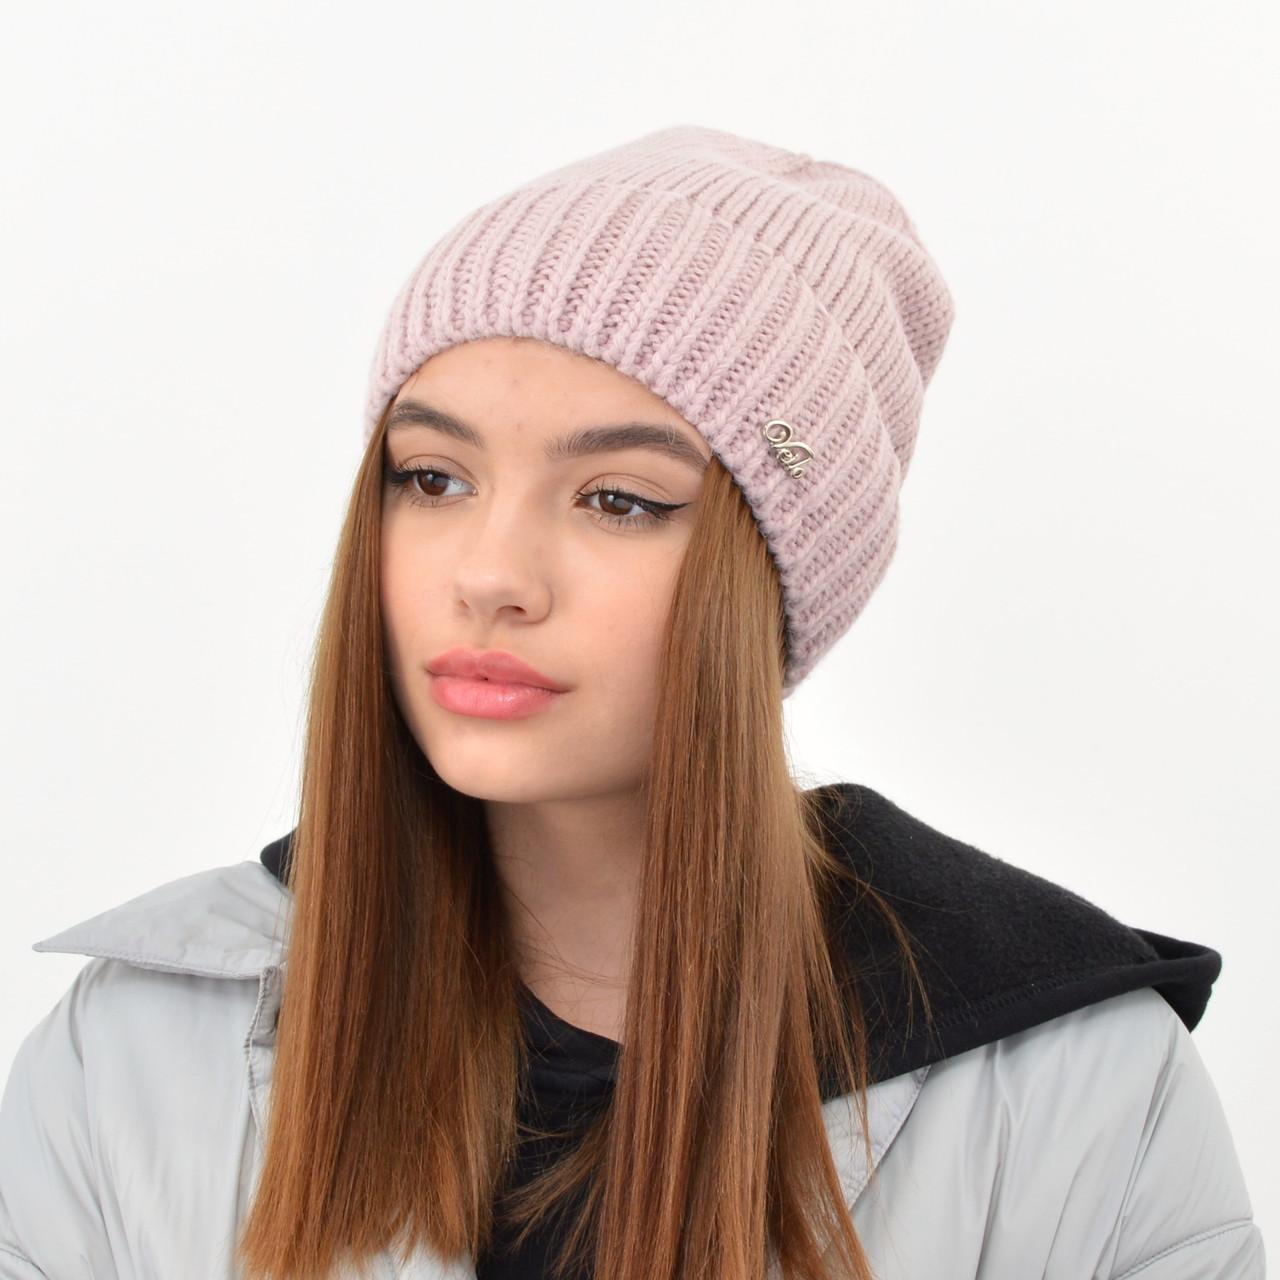 Женская шапка veilo на флисе 3389  пудра